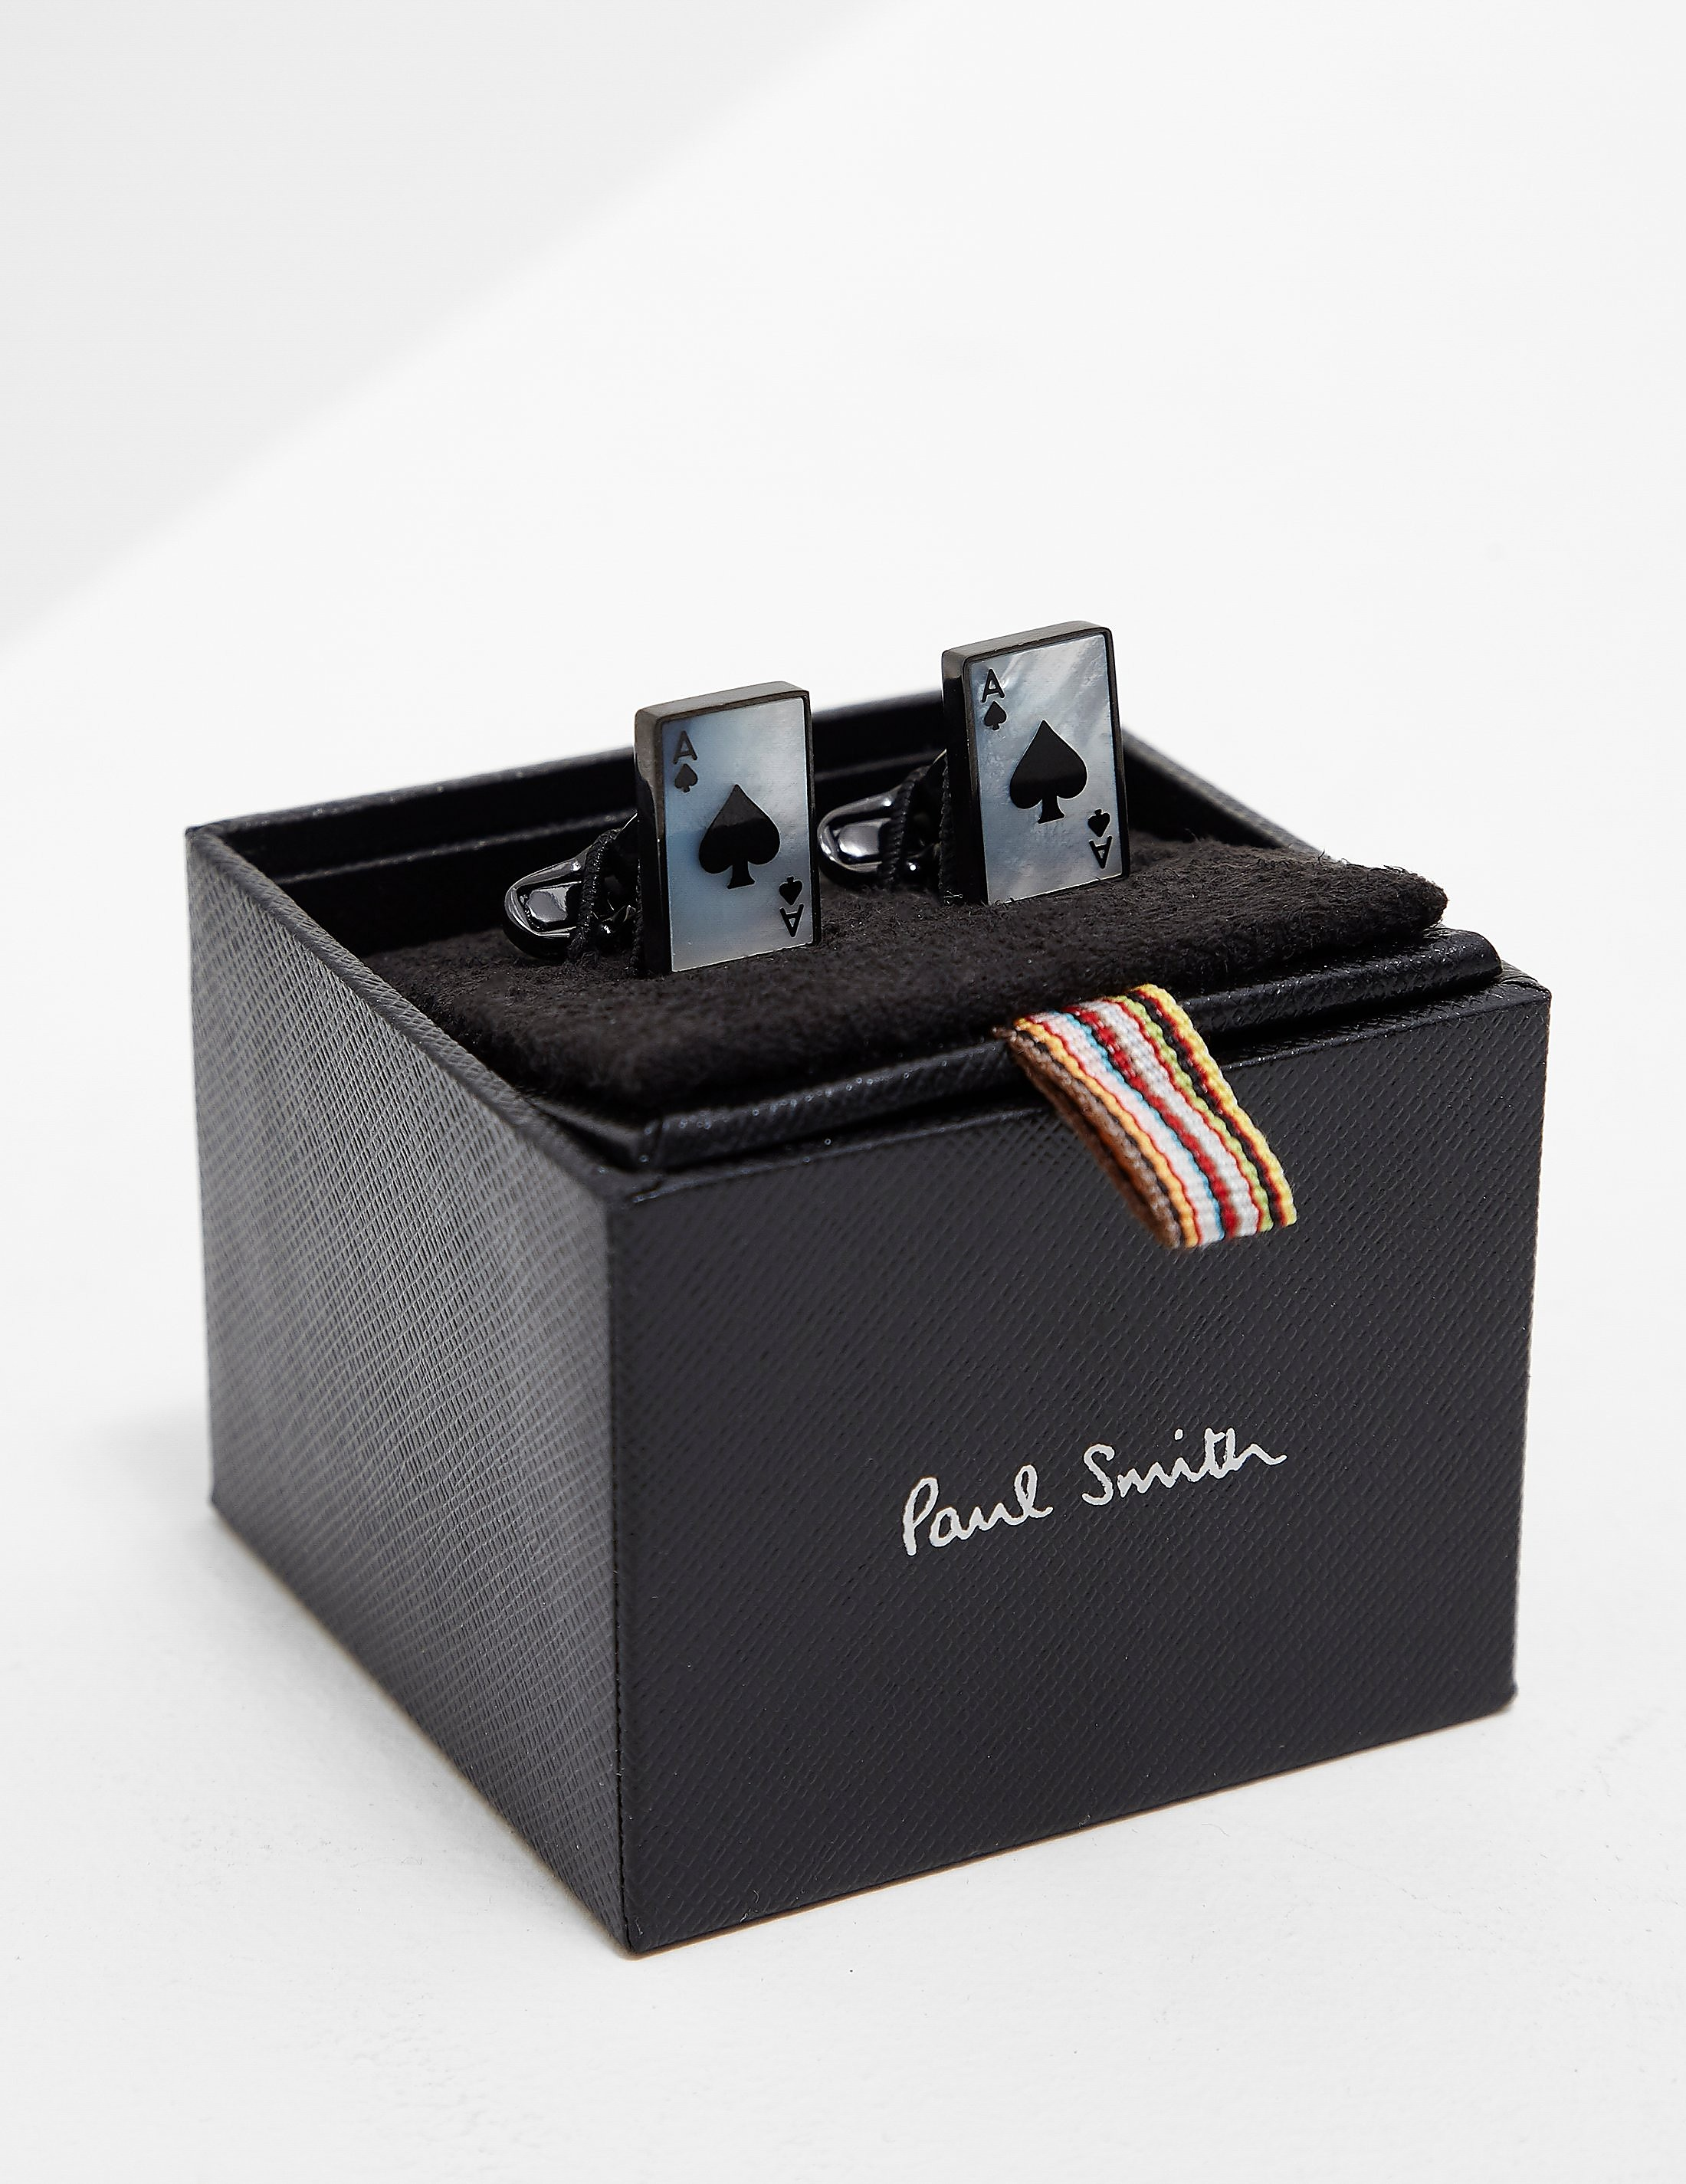 PS Paul Smith Ace of Spades Cufflinks